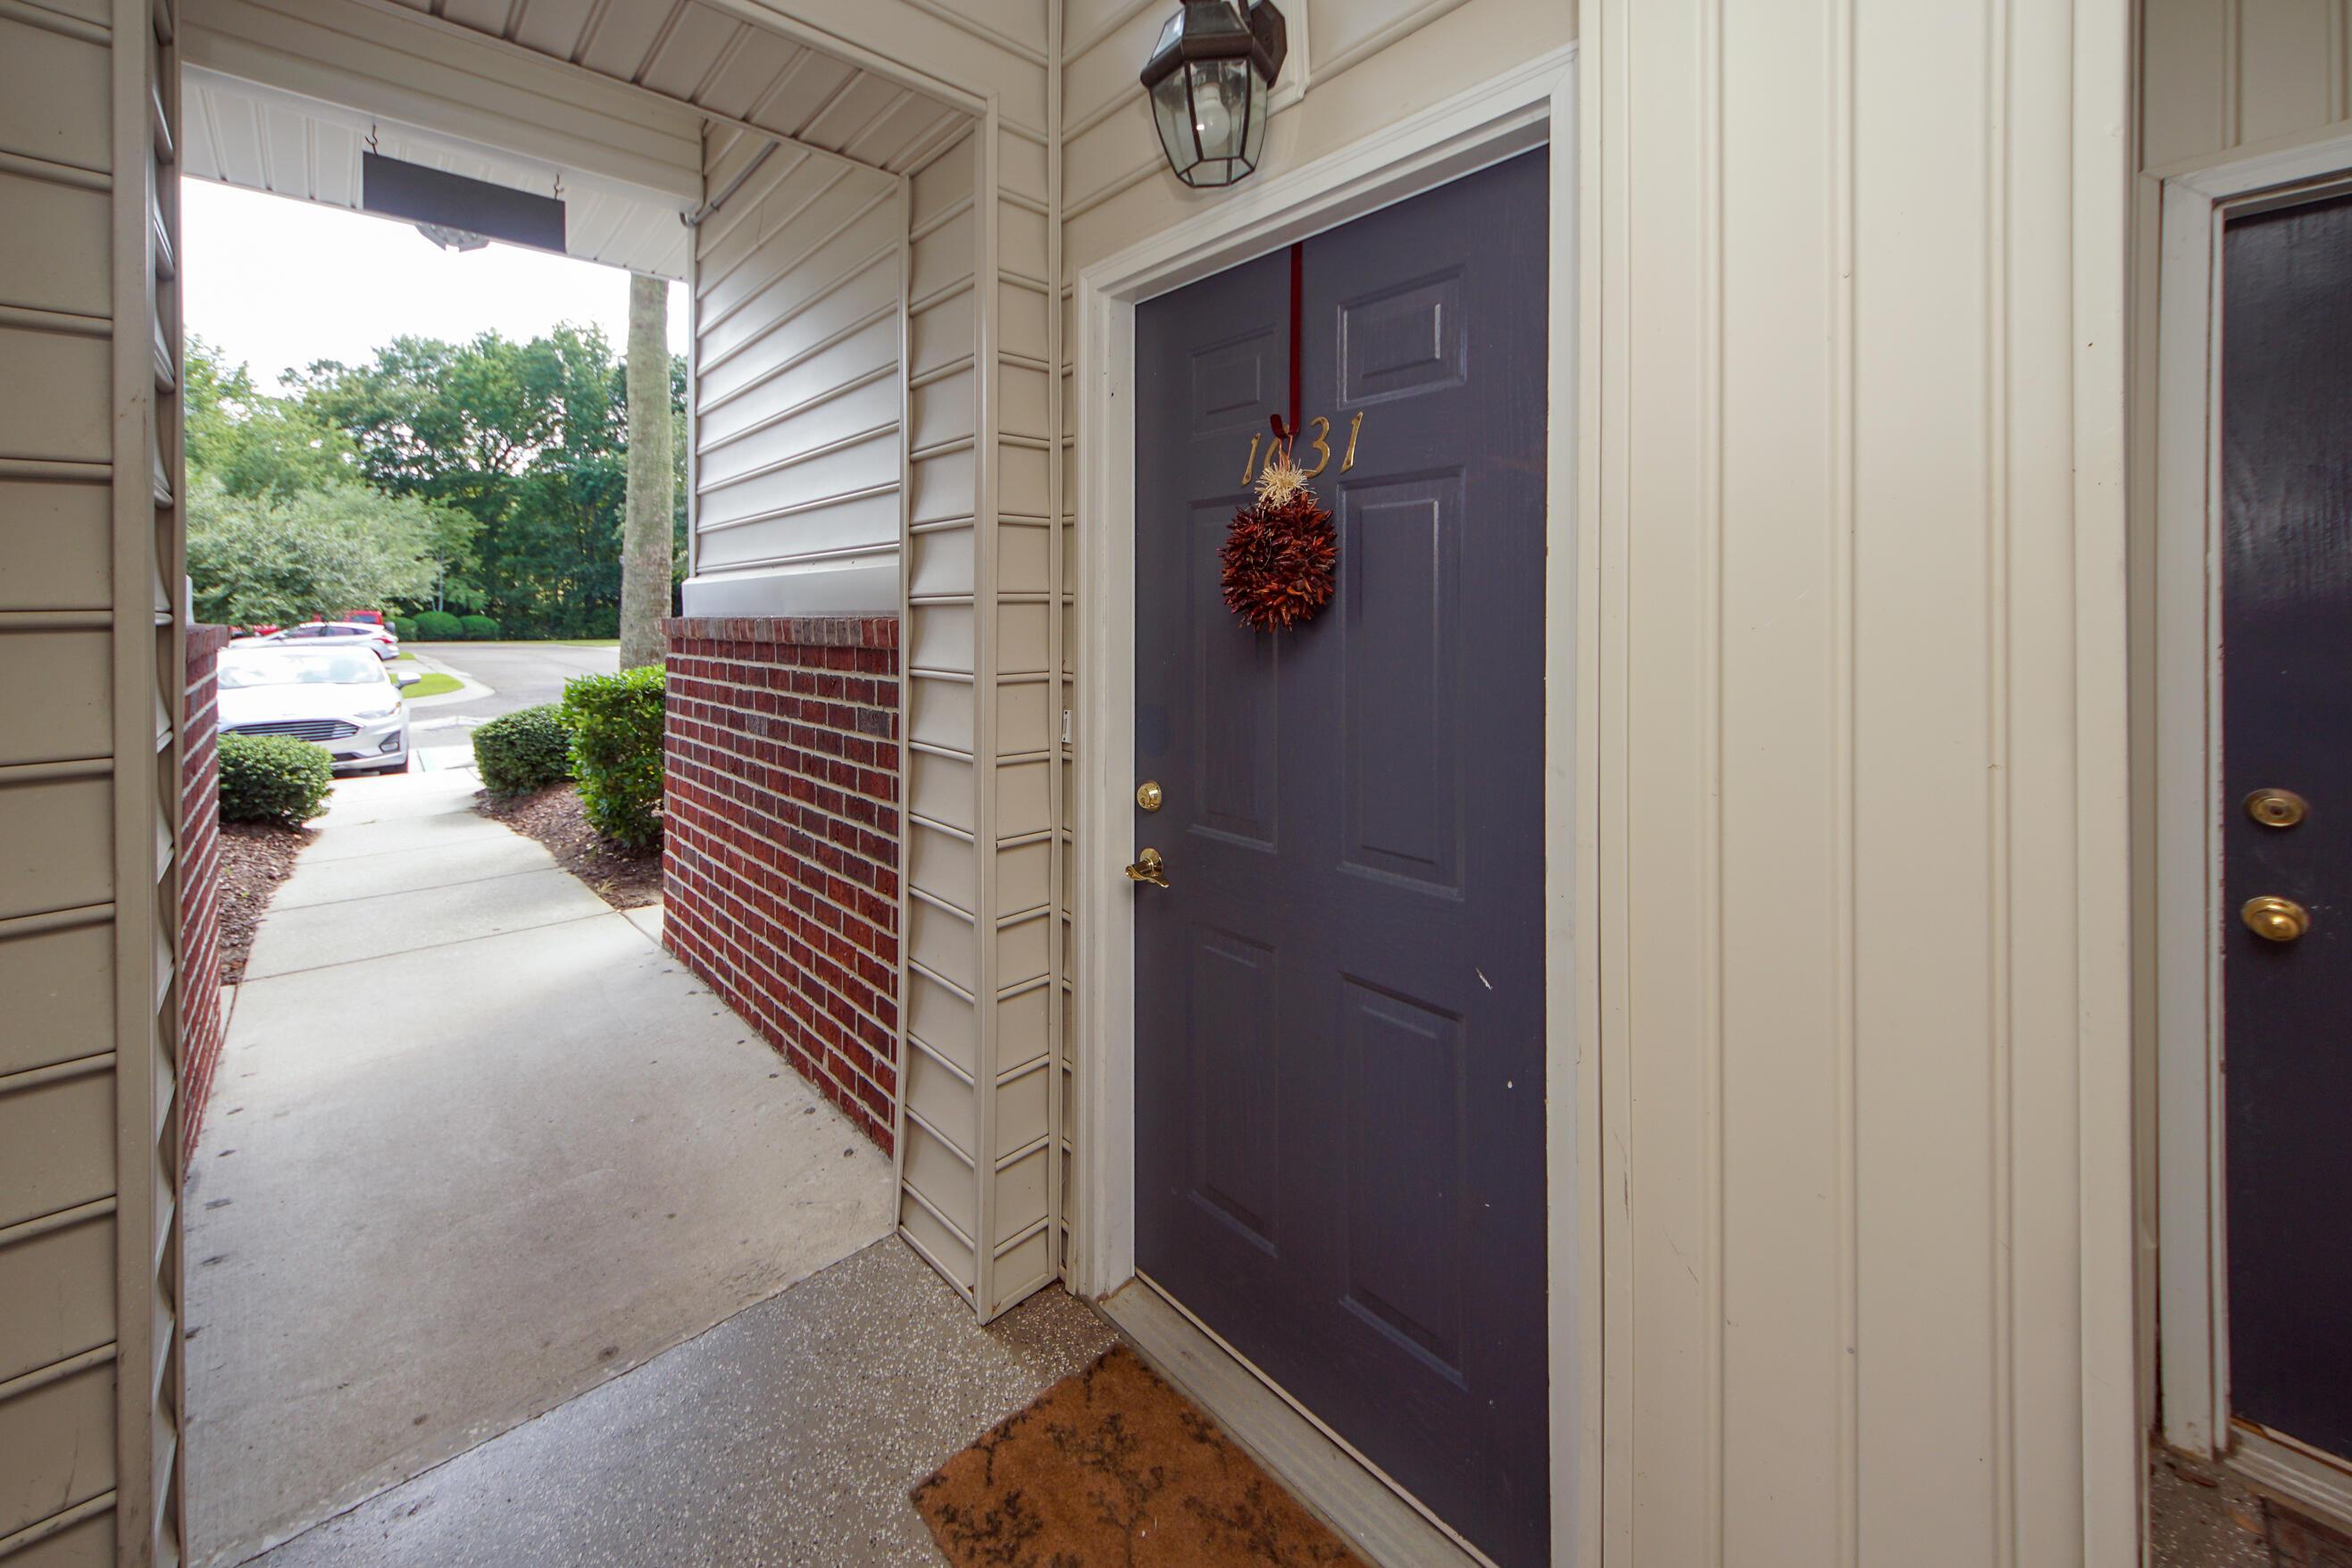 Dunes West Homes For Sale - 1631 Camfield, Mount Pleasant, SC - 14